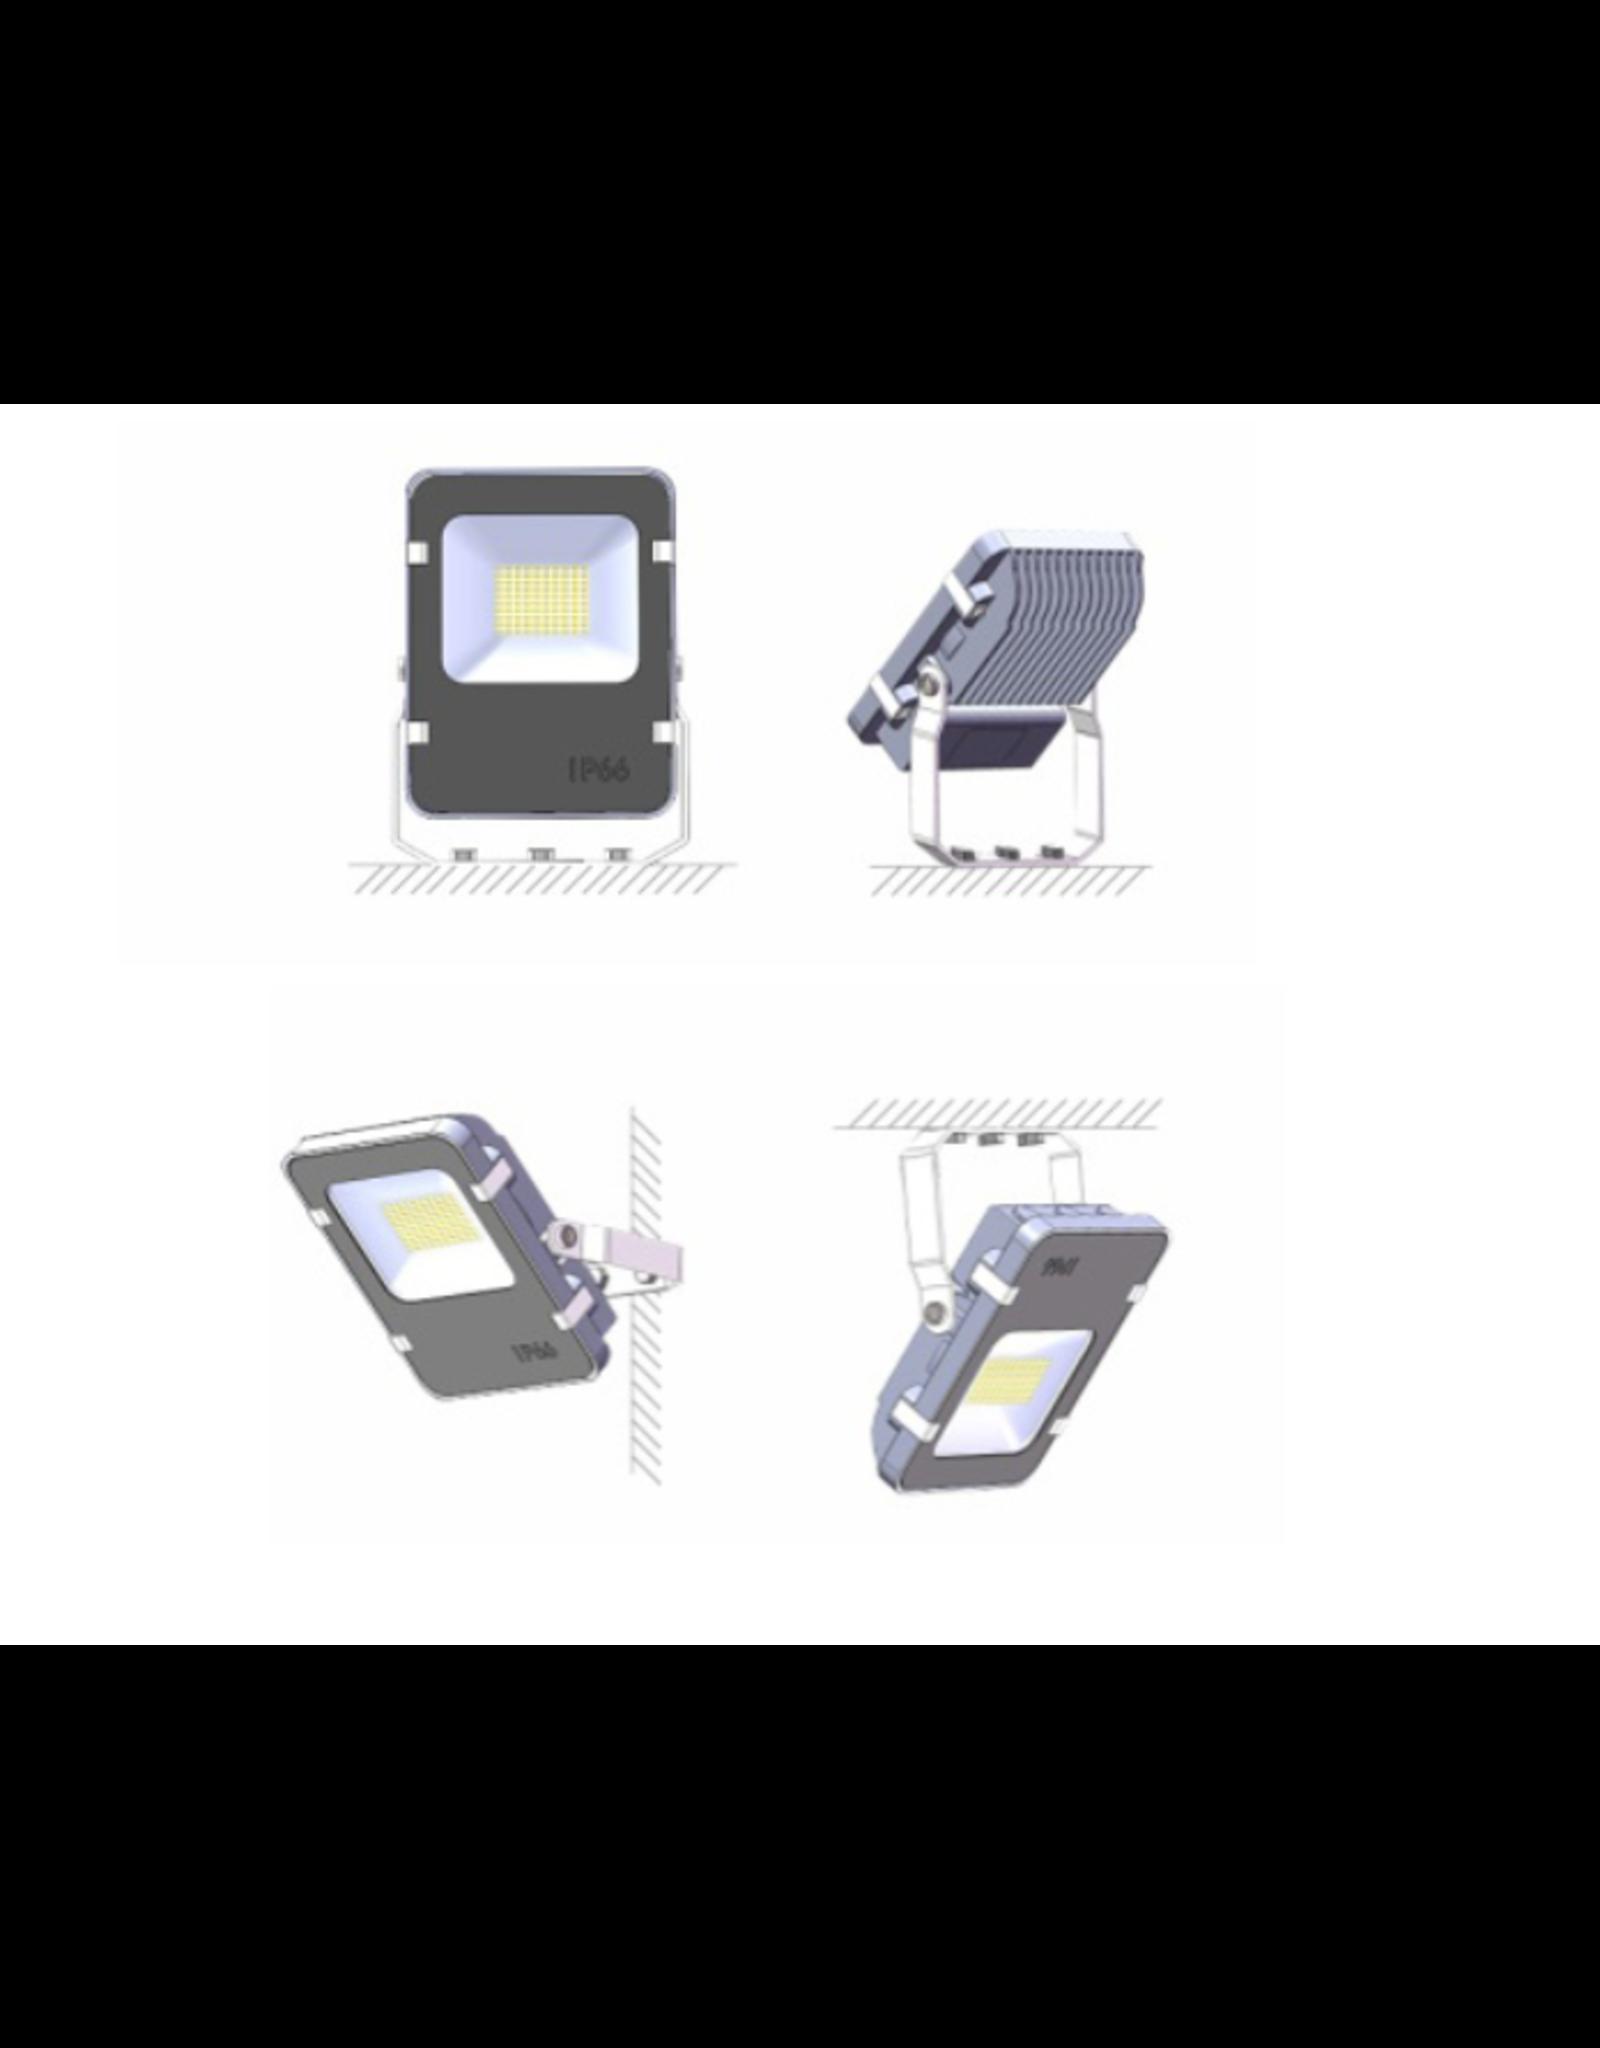 LedLed LED Swelo Schijnwerper IP66 72W